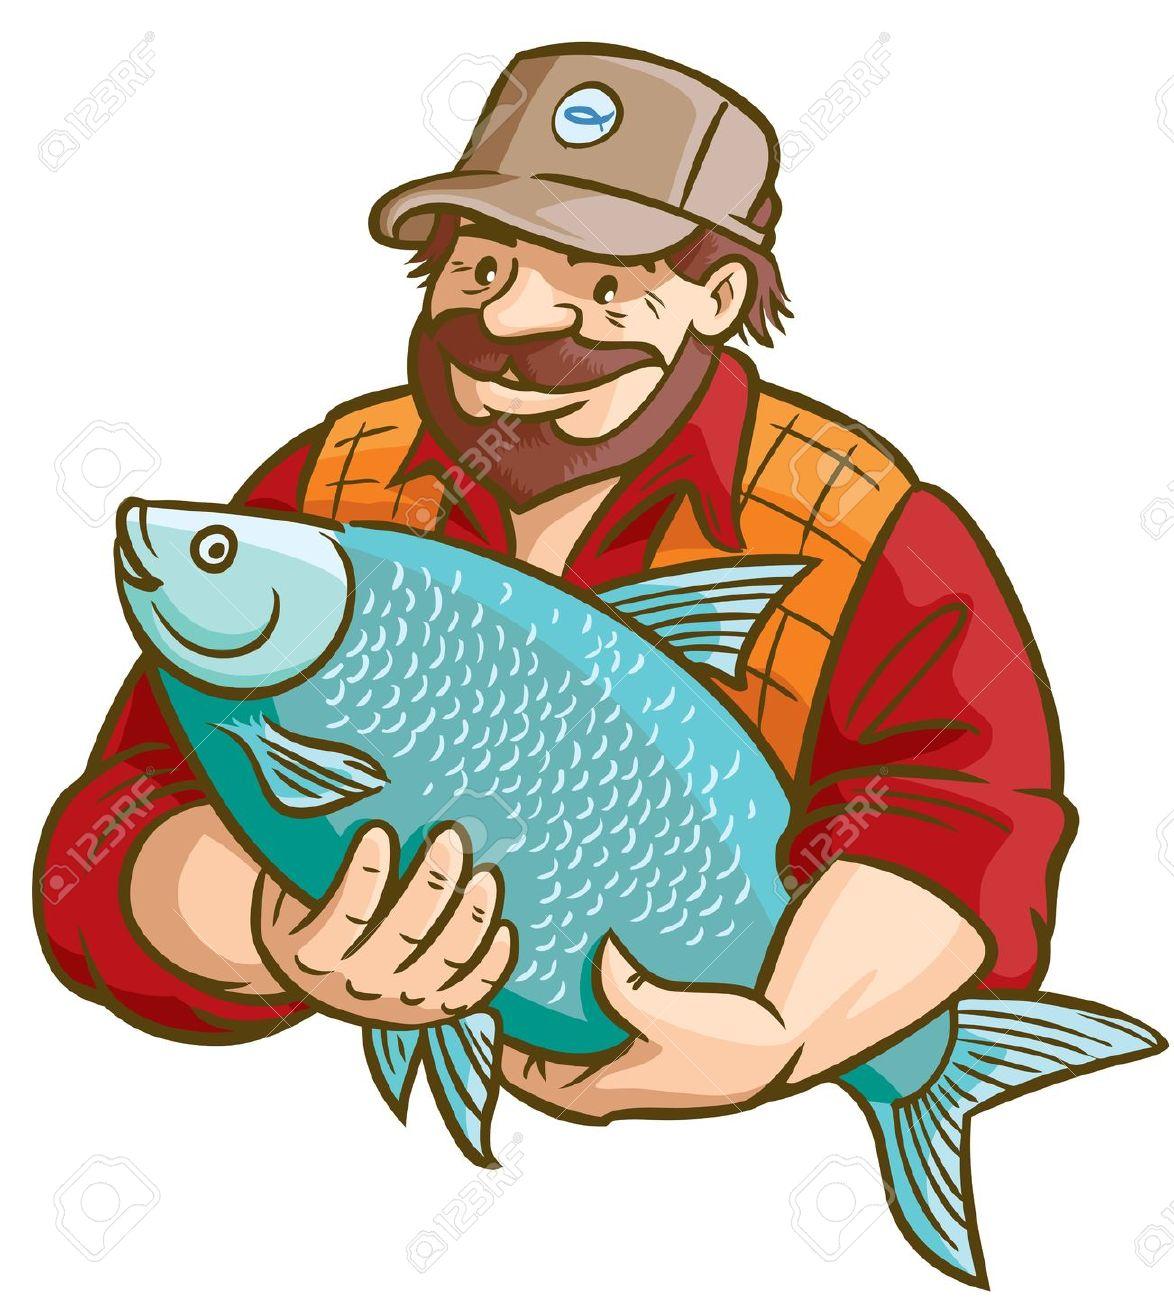 Fisherman vector clipart.